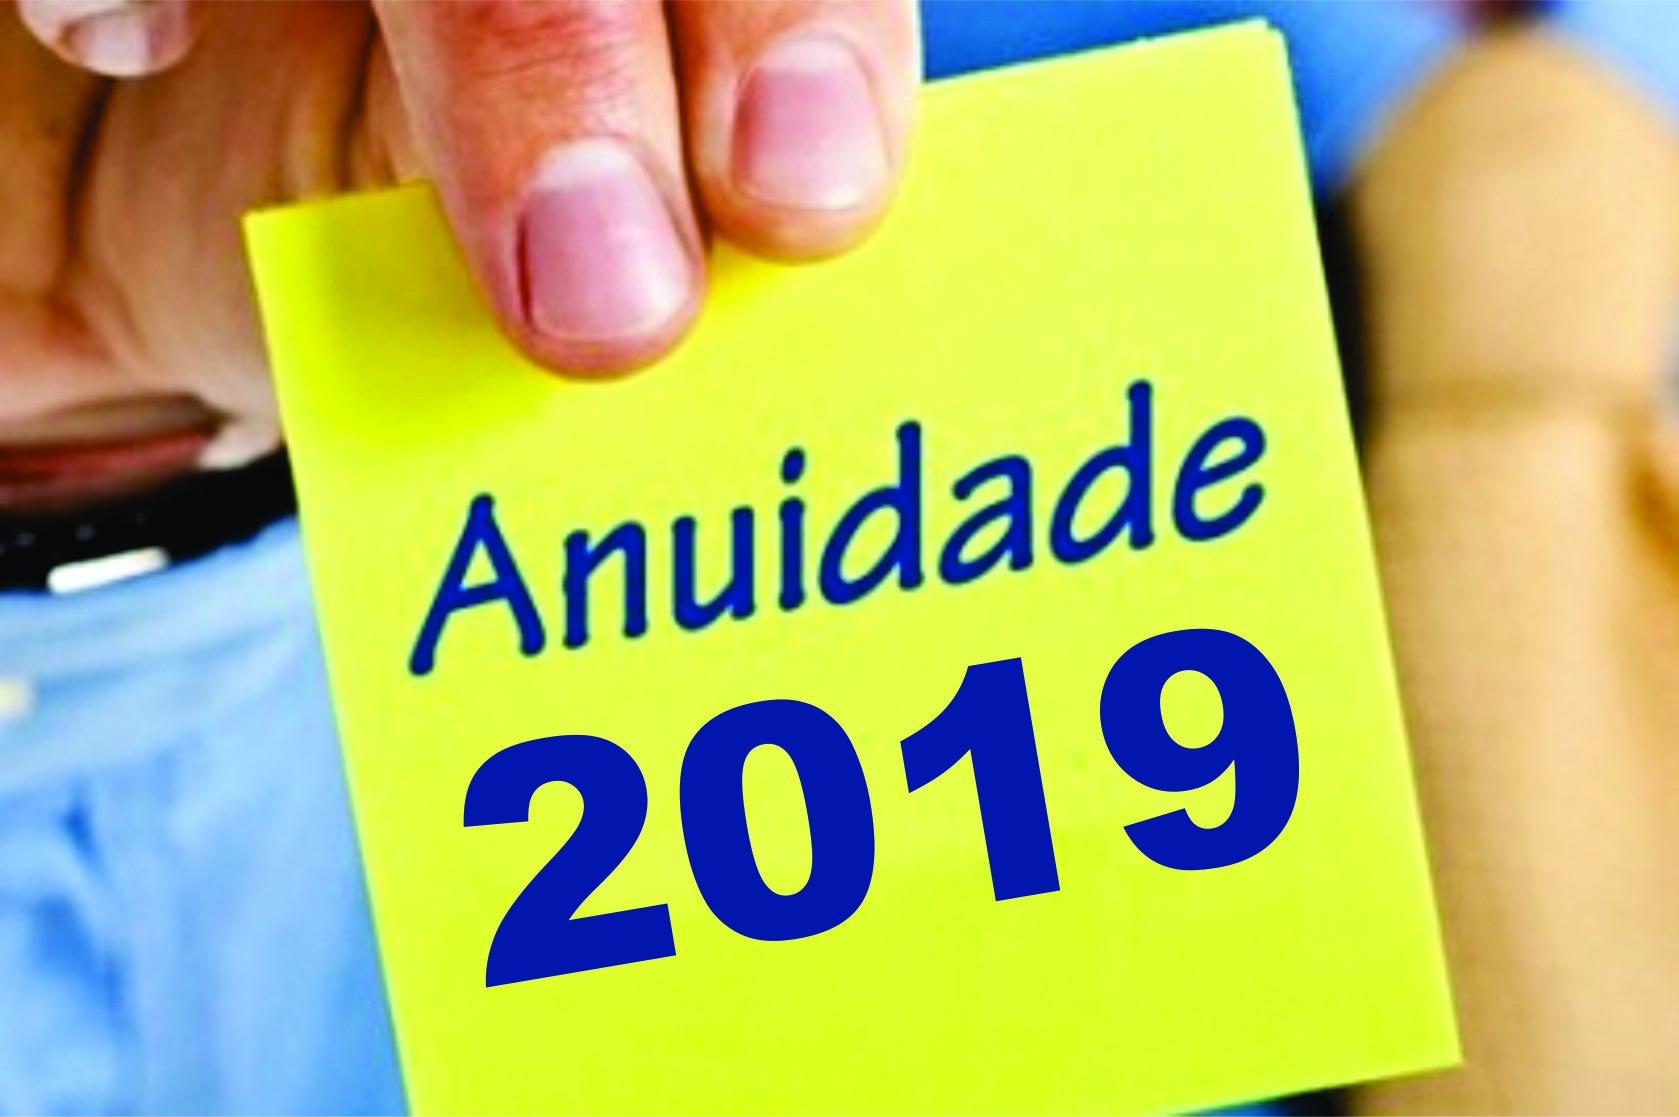 ANUIDADE DE ACADEMIAS E ATLETAS!